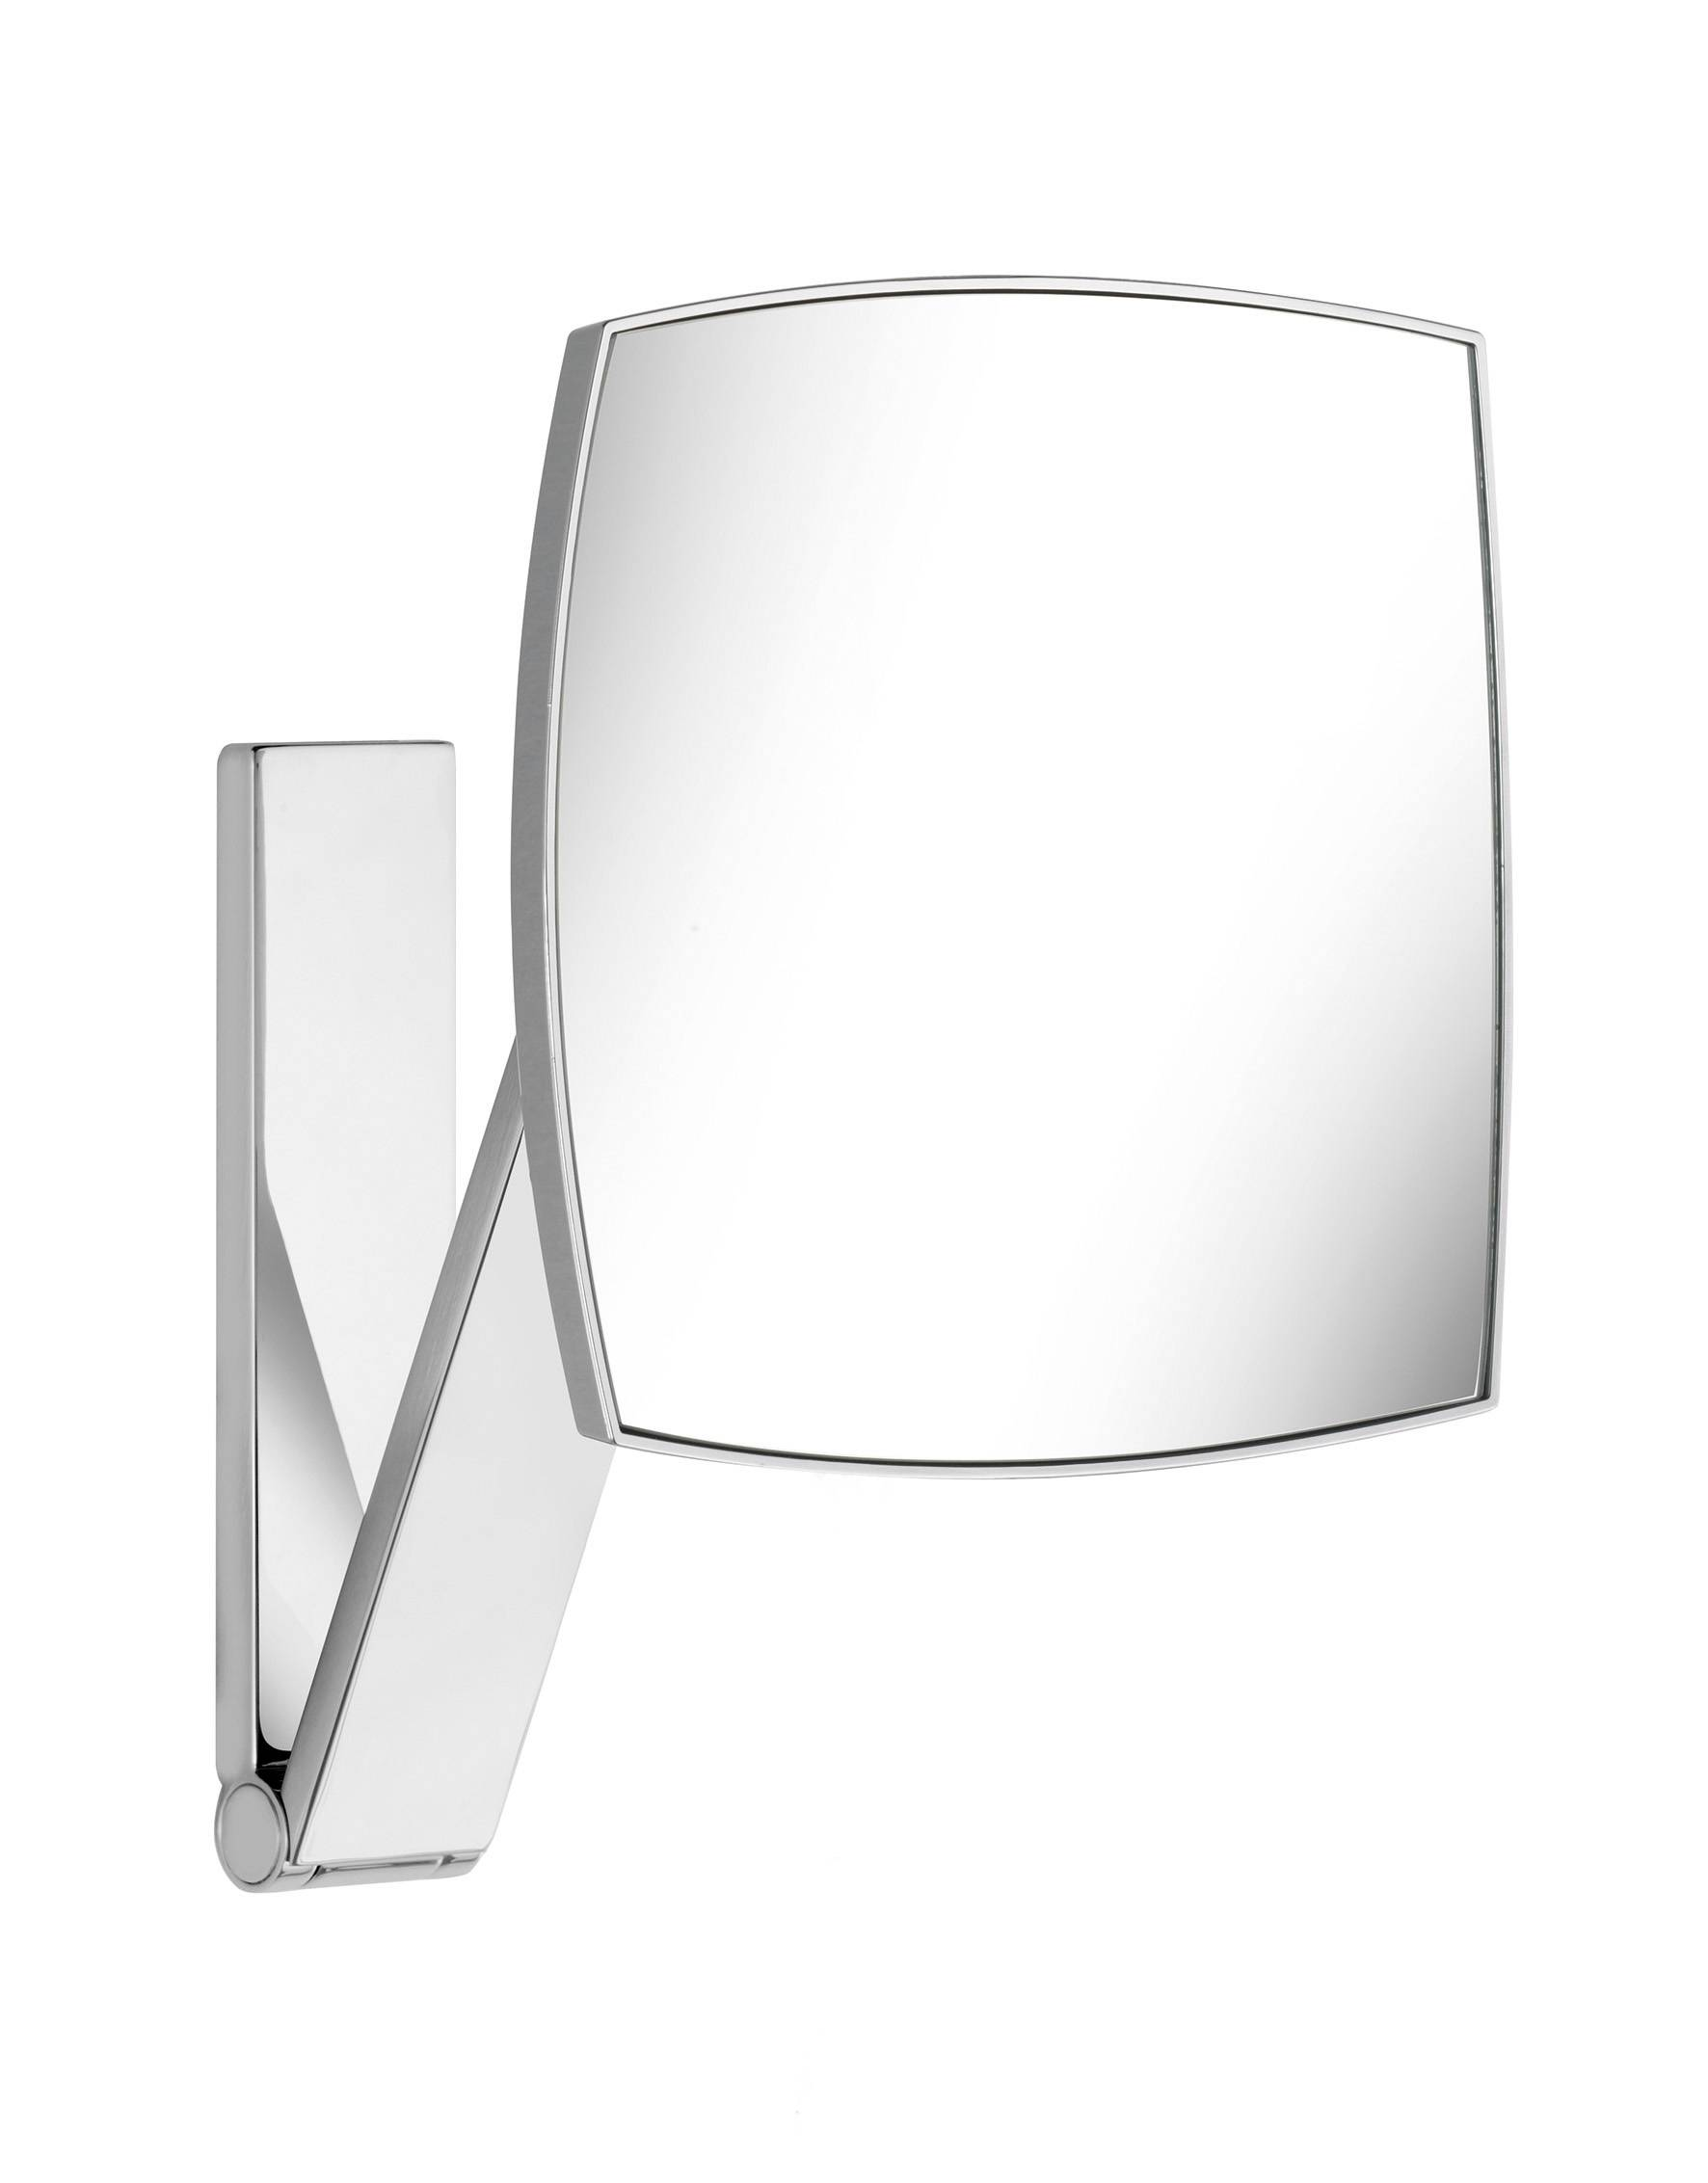 Keuco iLook_move - Miroir cosmétique finition acier inoxydable